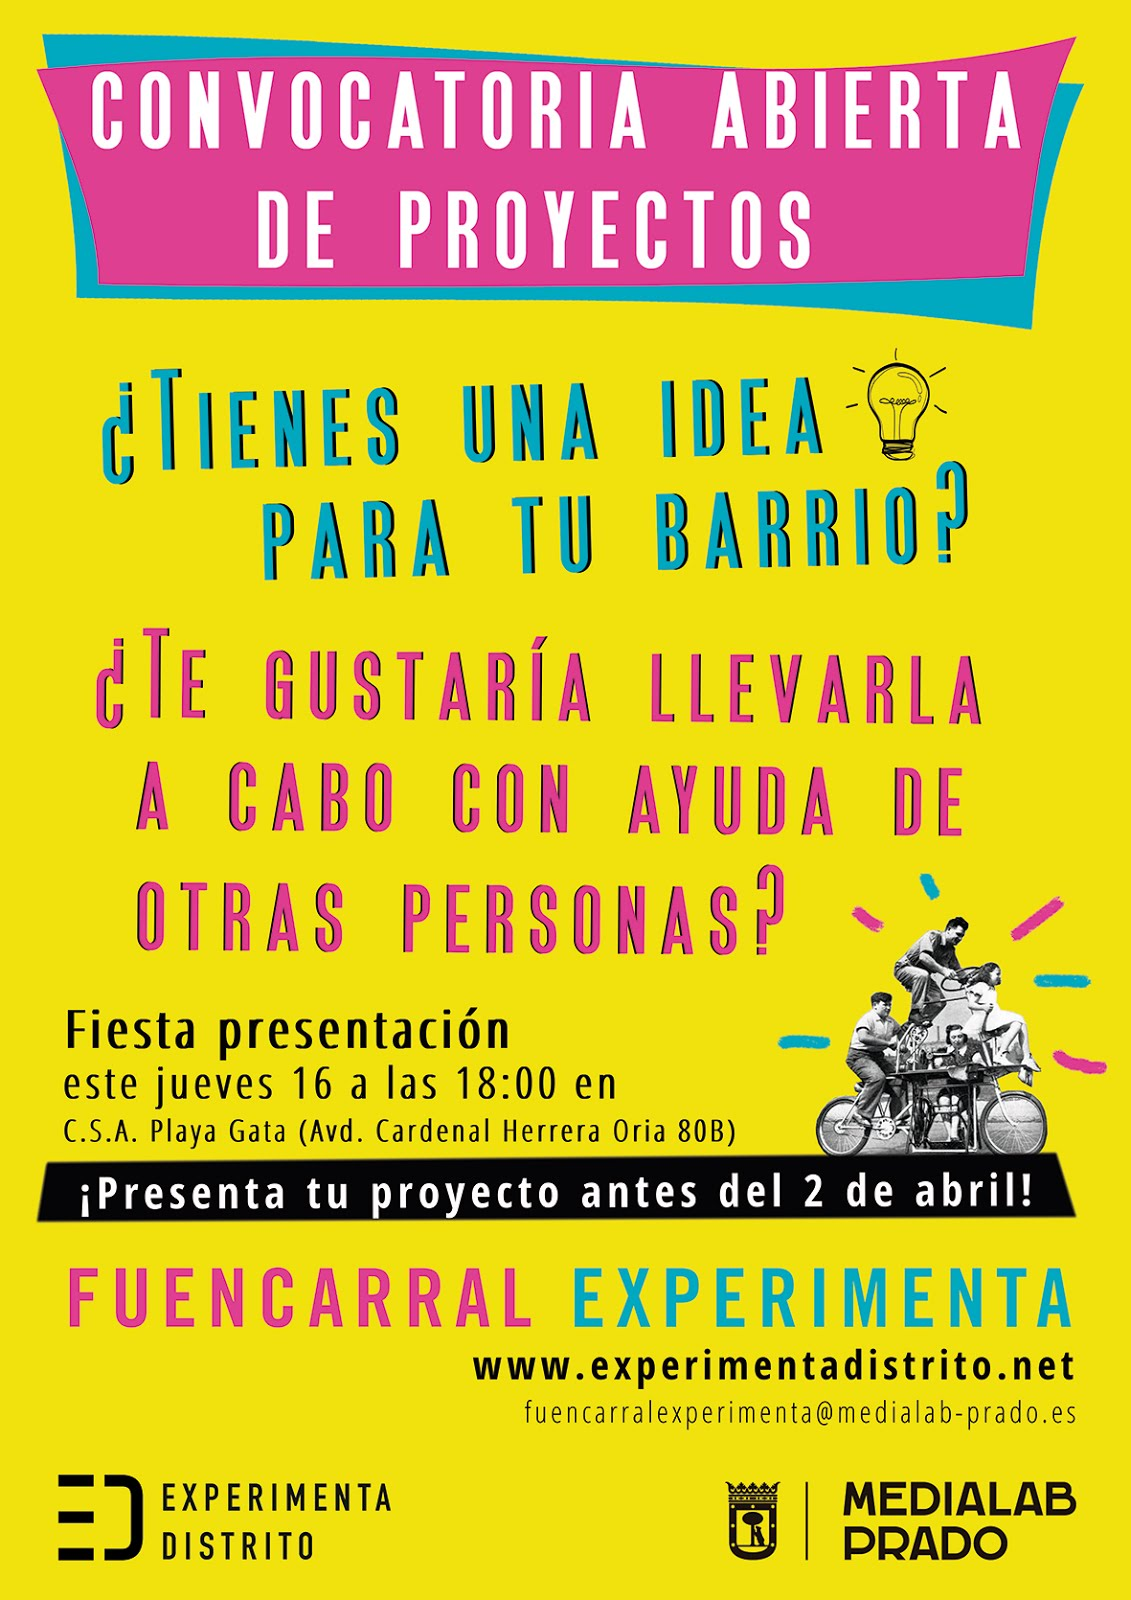 16 de marzo Fuencarral experimenta